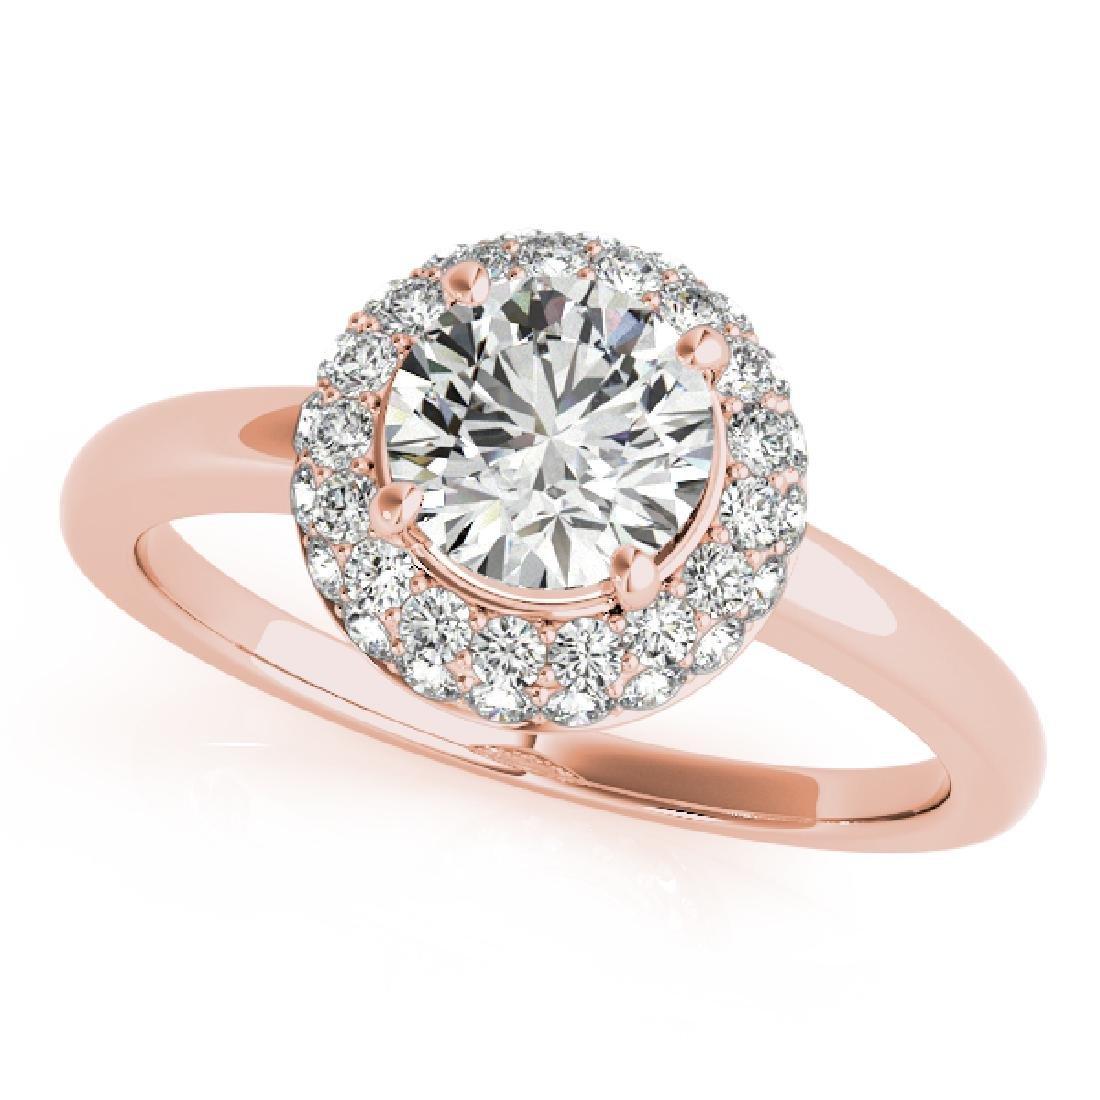 CERTIFIED 18K ROSE GOLD 1.45 CT G-H/VS-SI1 DIAMOND HALO